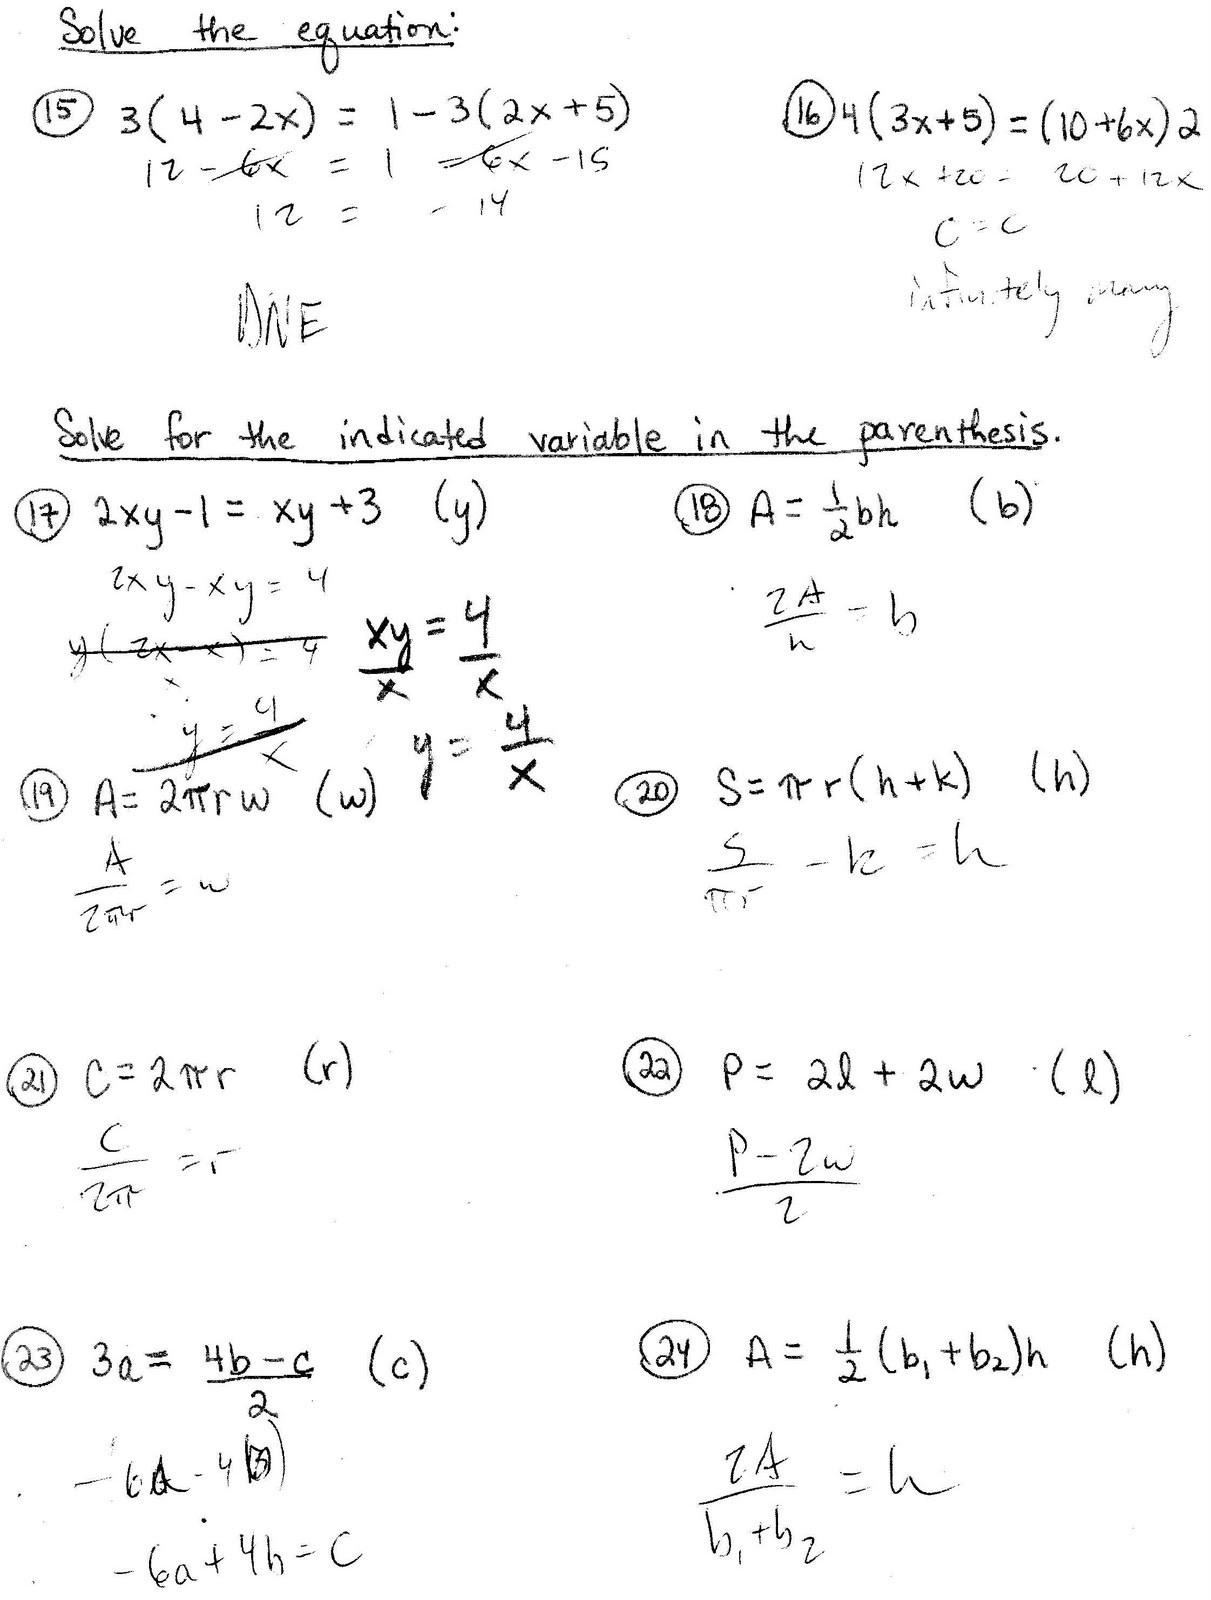 Literal Equation Worksheet - Kidz Activities